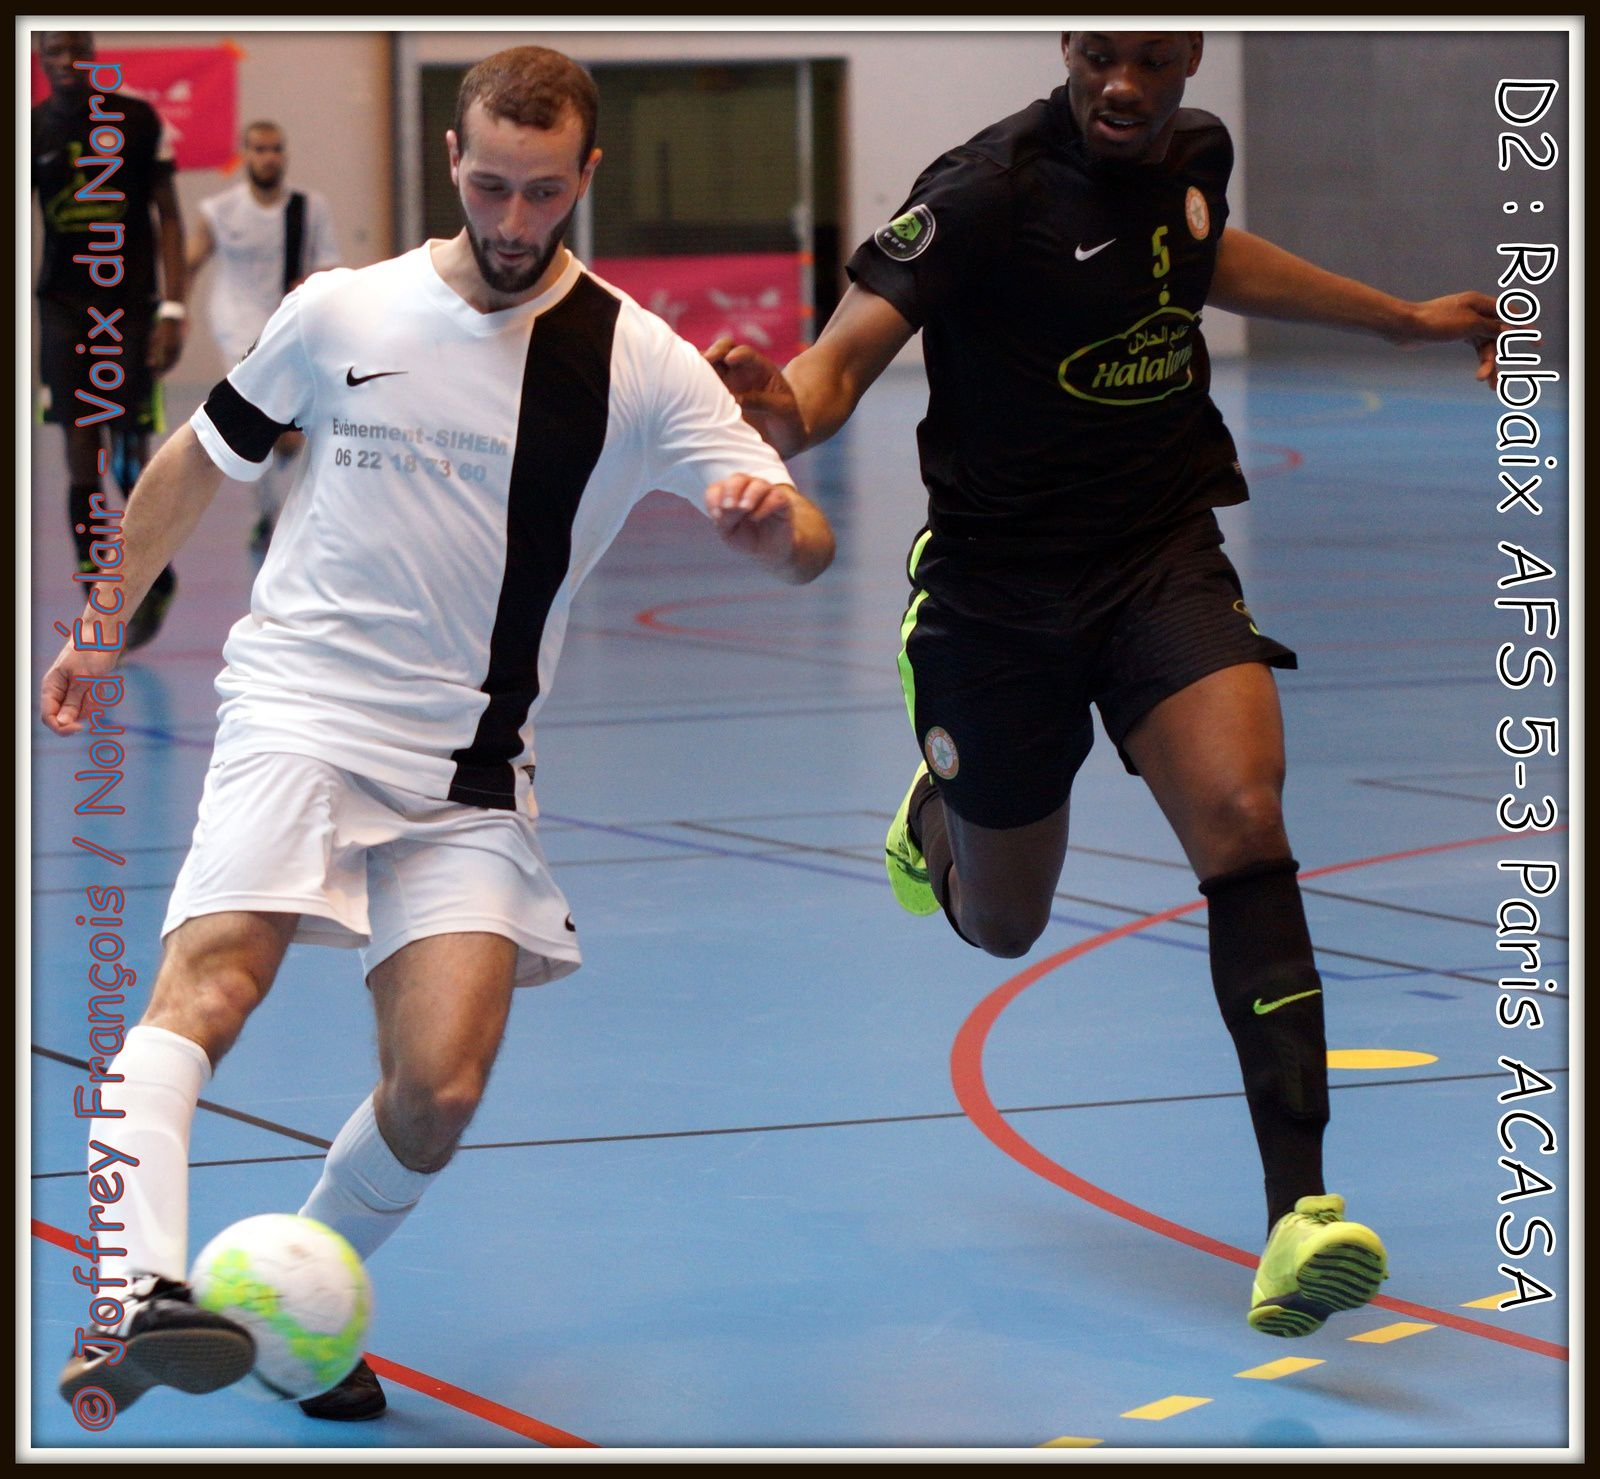 30.04.16 D2 Futsal Roubaix AFS - Paris ACASA